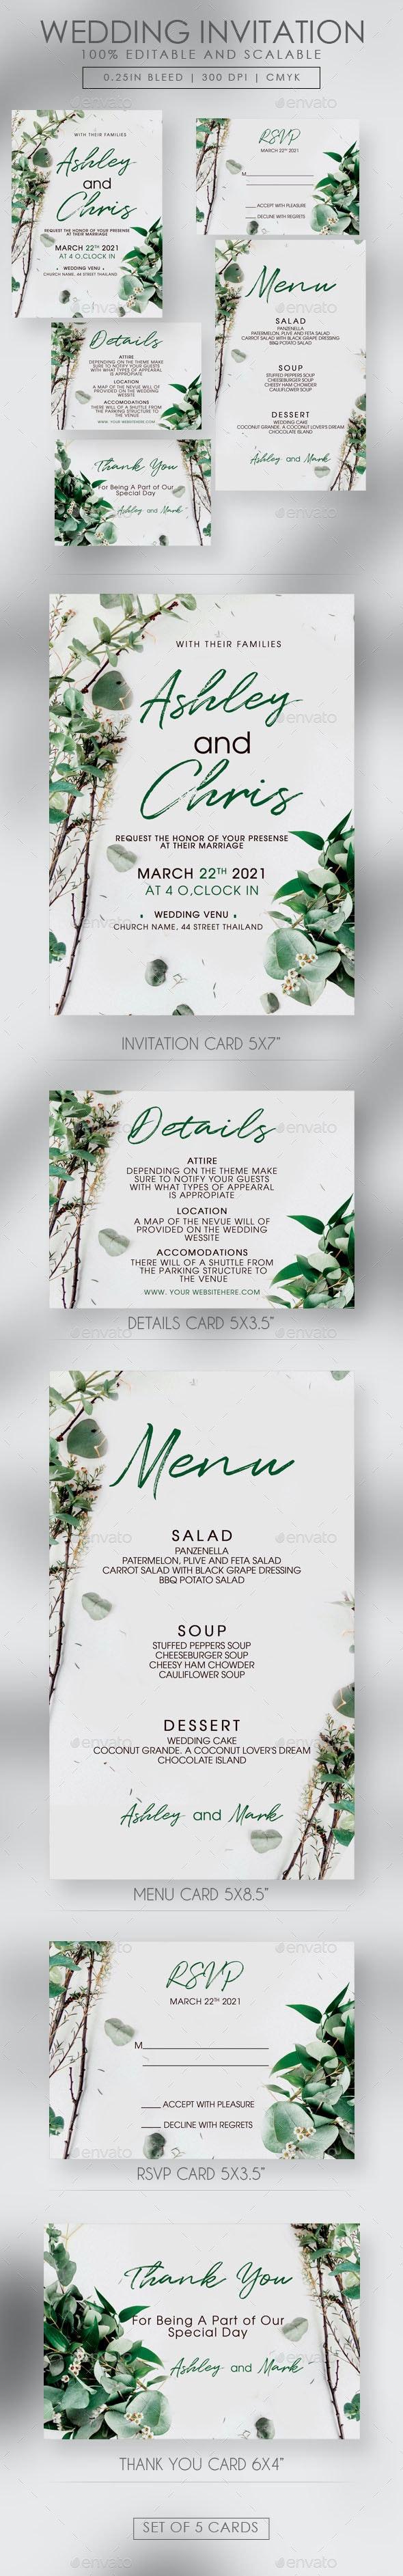 Wedding Invitation Suite - Weddings Cards & Invites